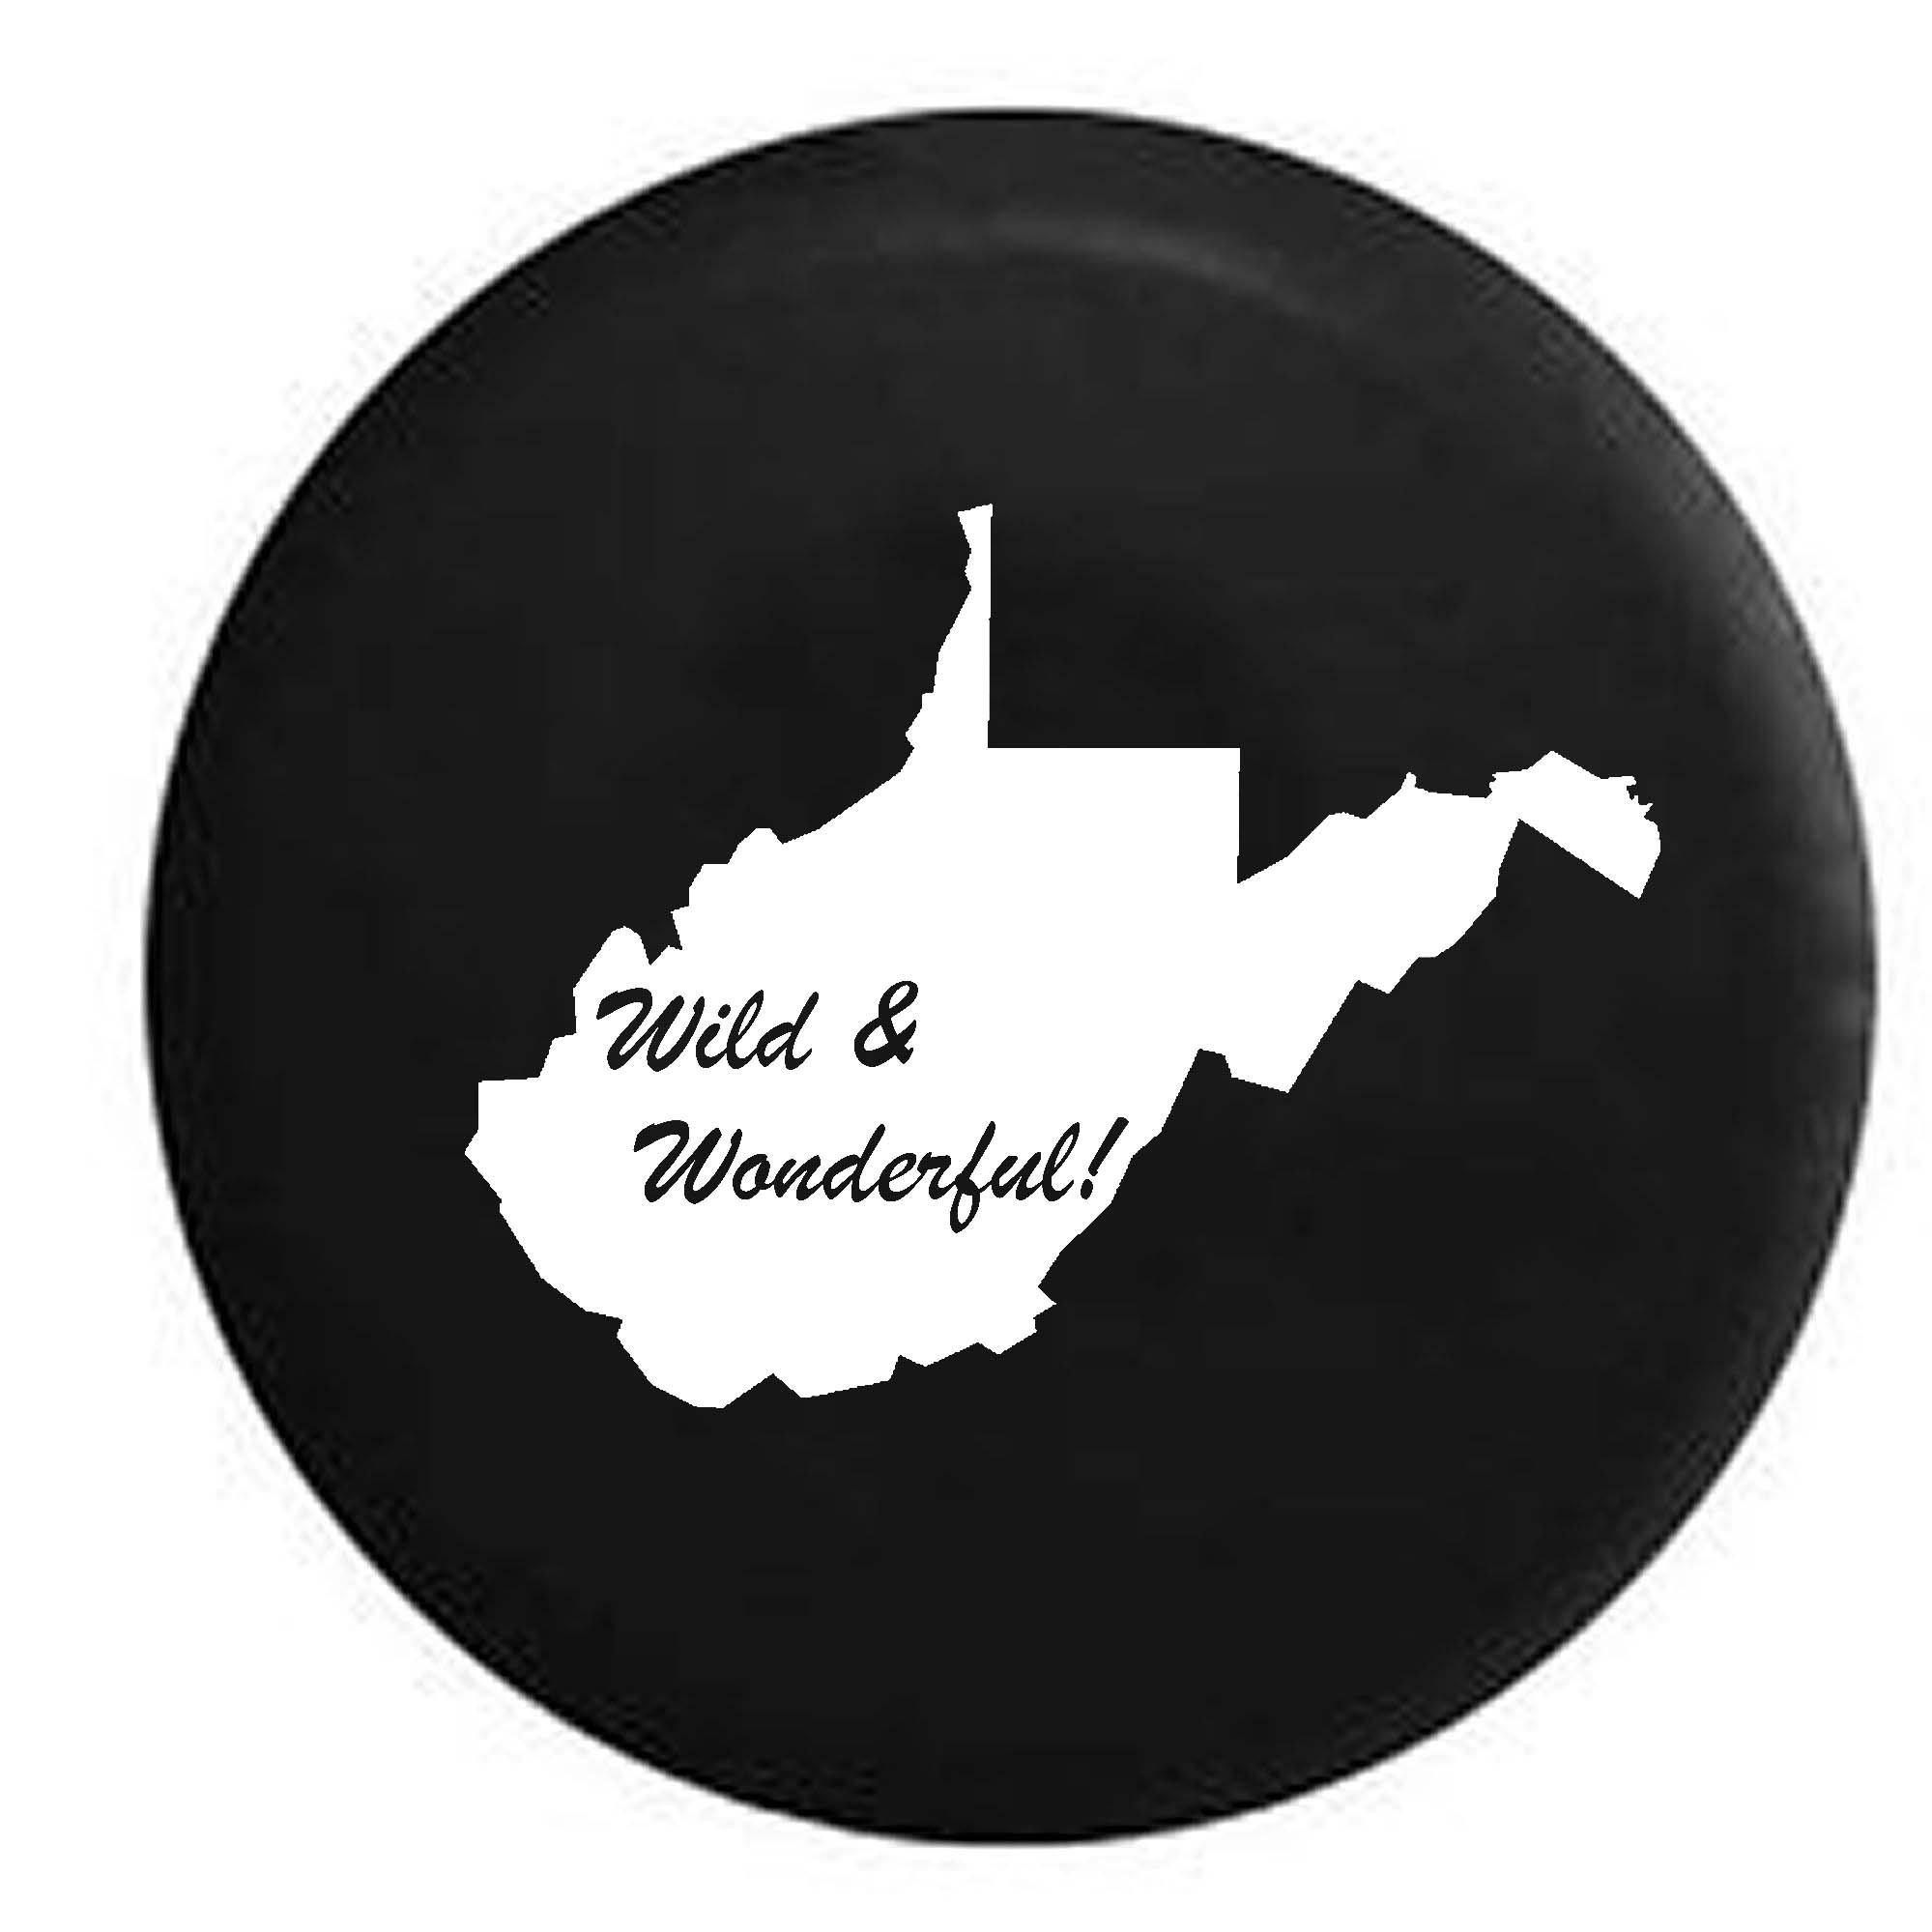 West Virginia Wild & Wonderful State Edition RV Spare Tire Cover OEM Vinyl Black 27.5 in